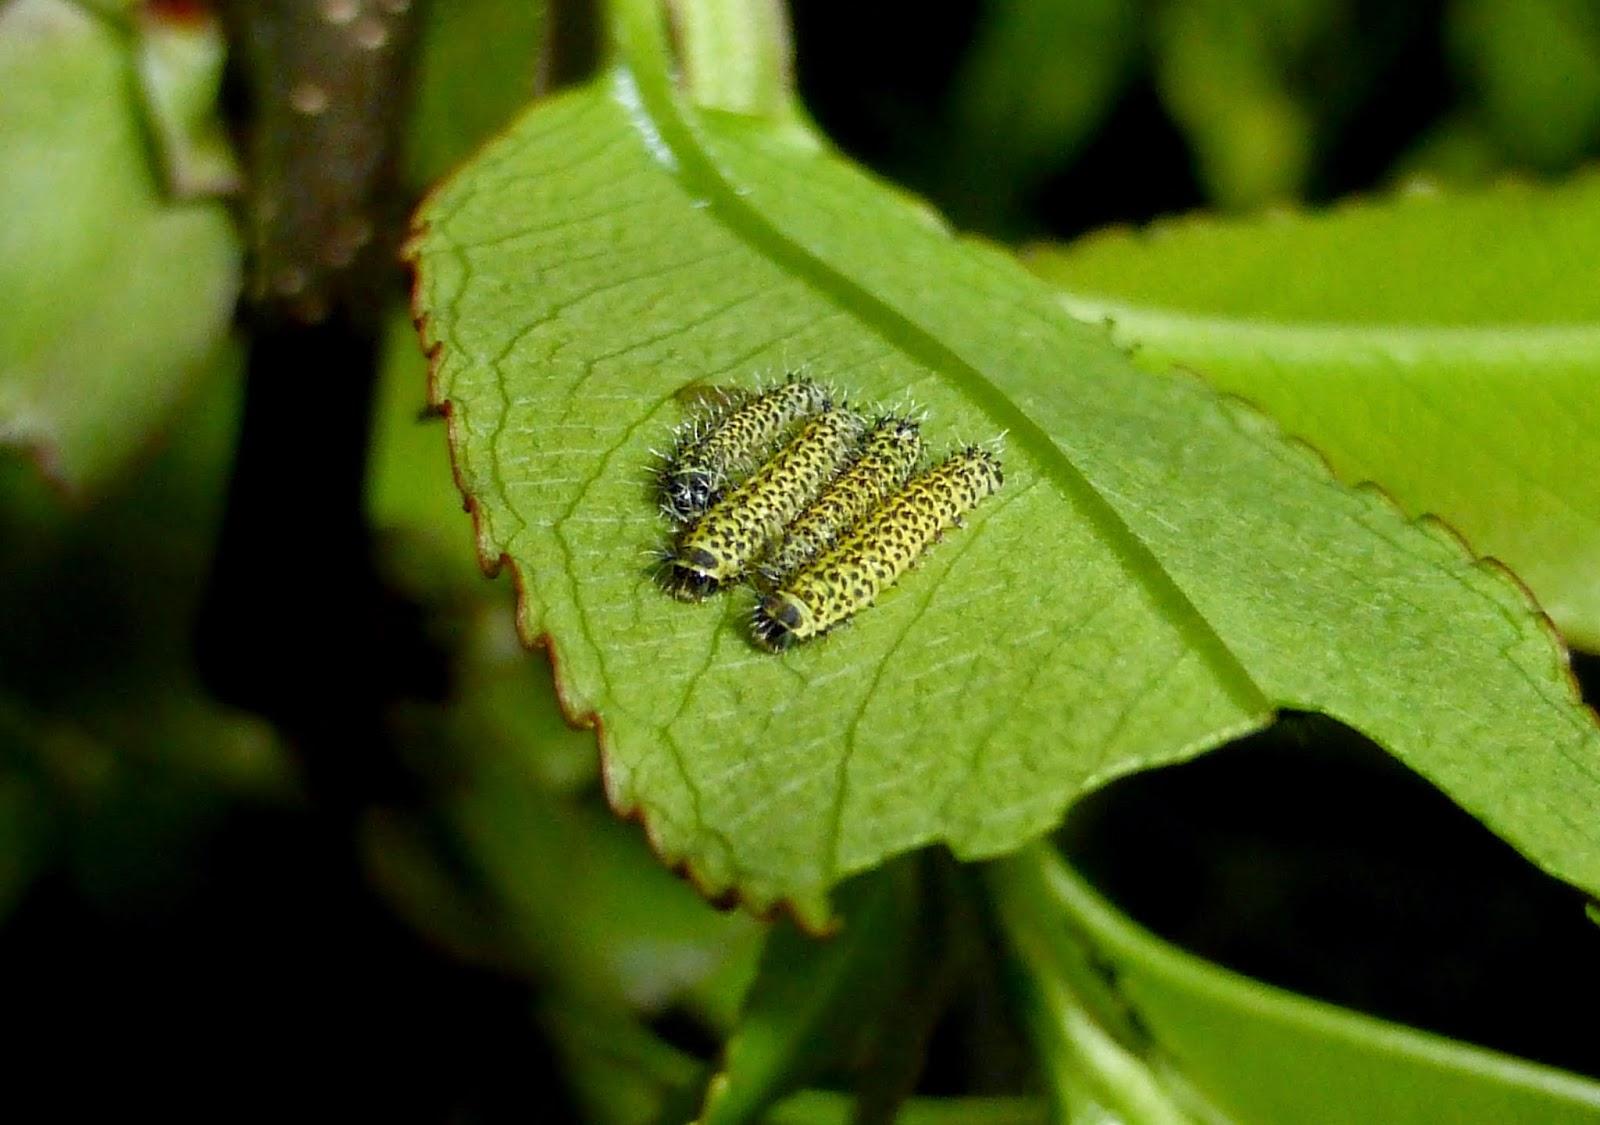 Samia cynthia walkeri caterpillars